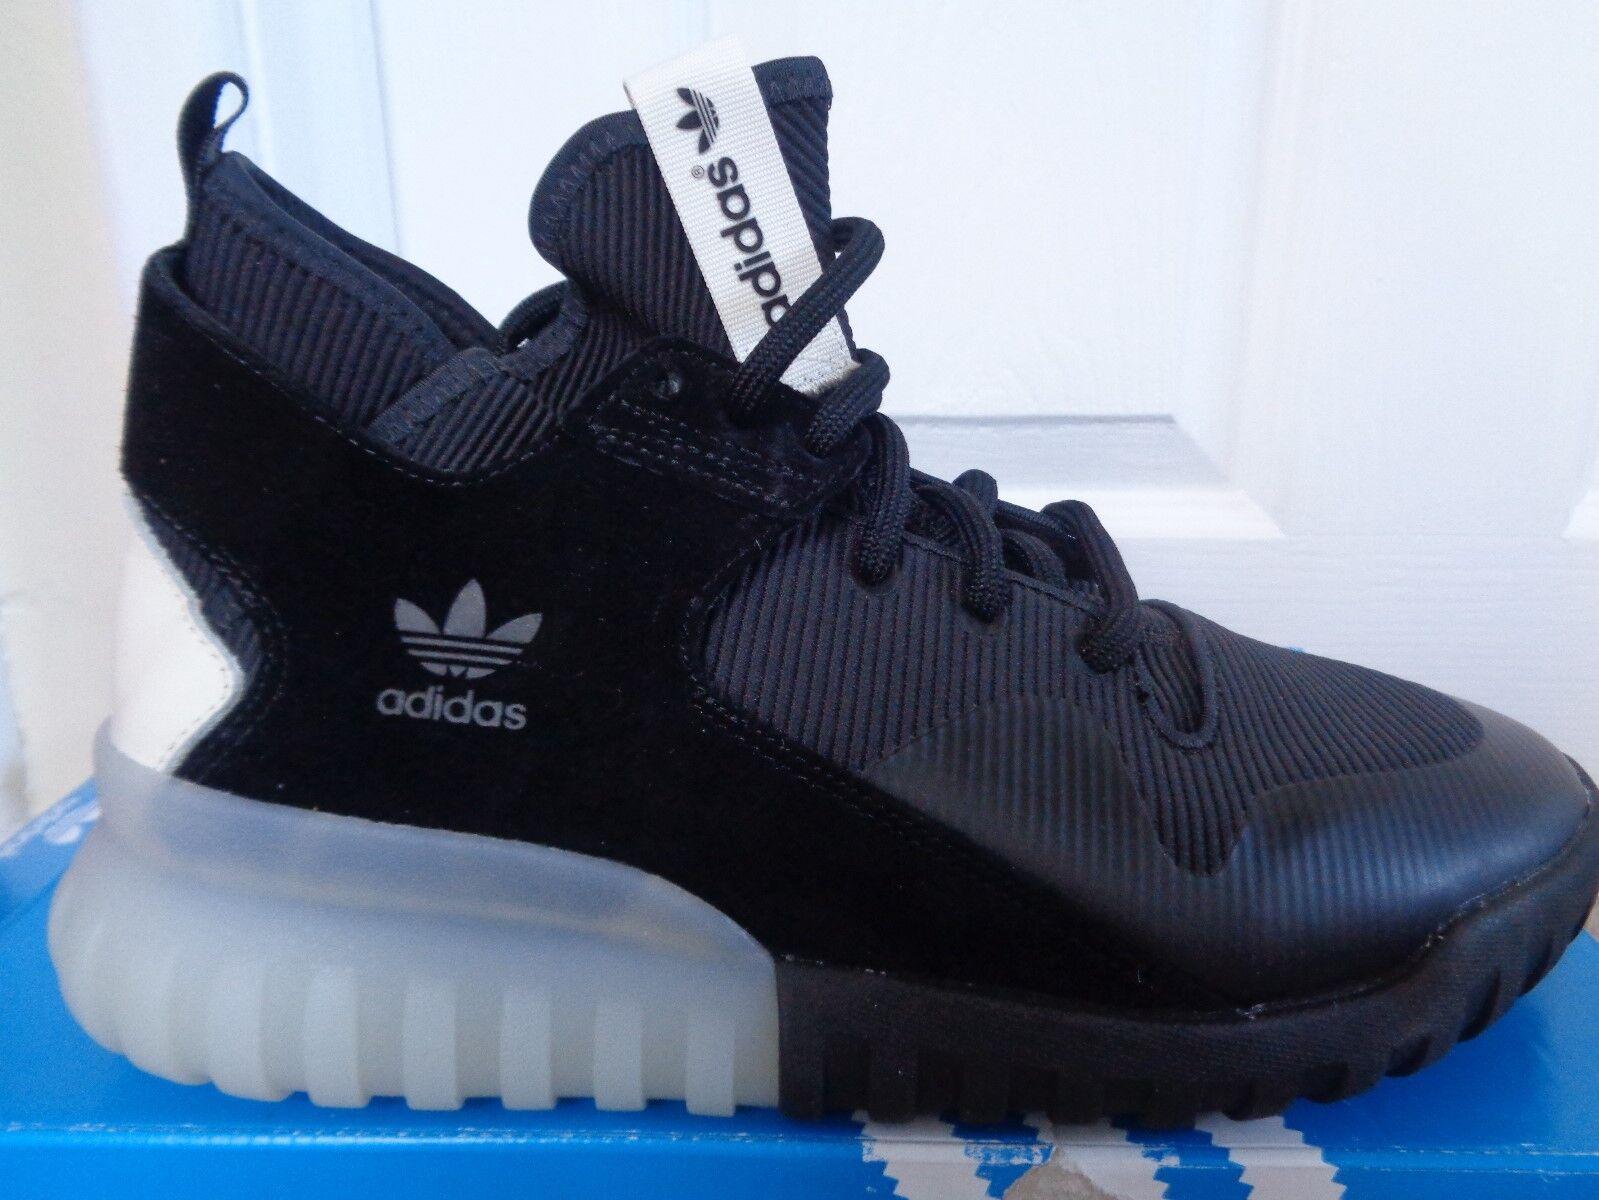 Adidas Tubular X  trainers sneakers shoes S74924 uk 7 eu 40 2/3 us 7.5 NEW+BOX